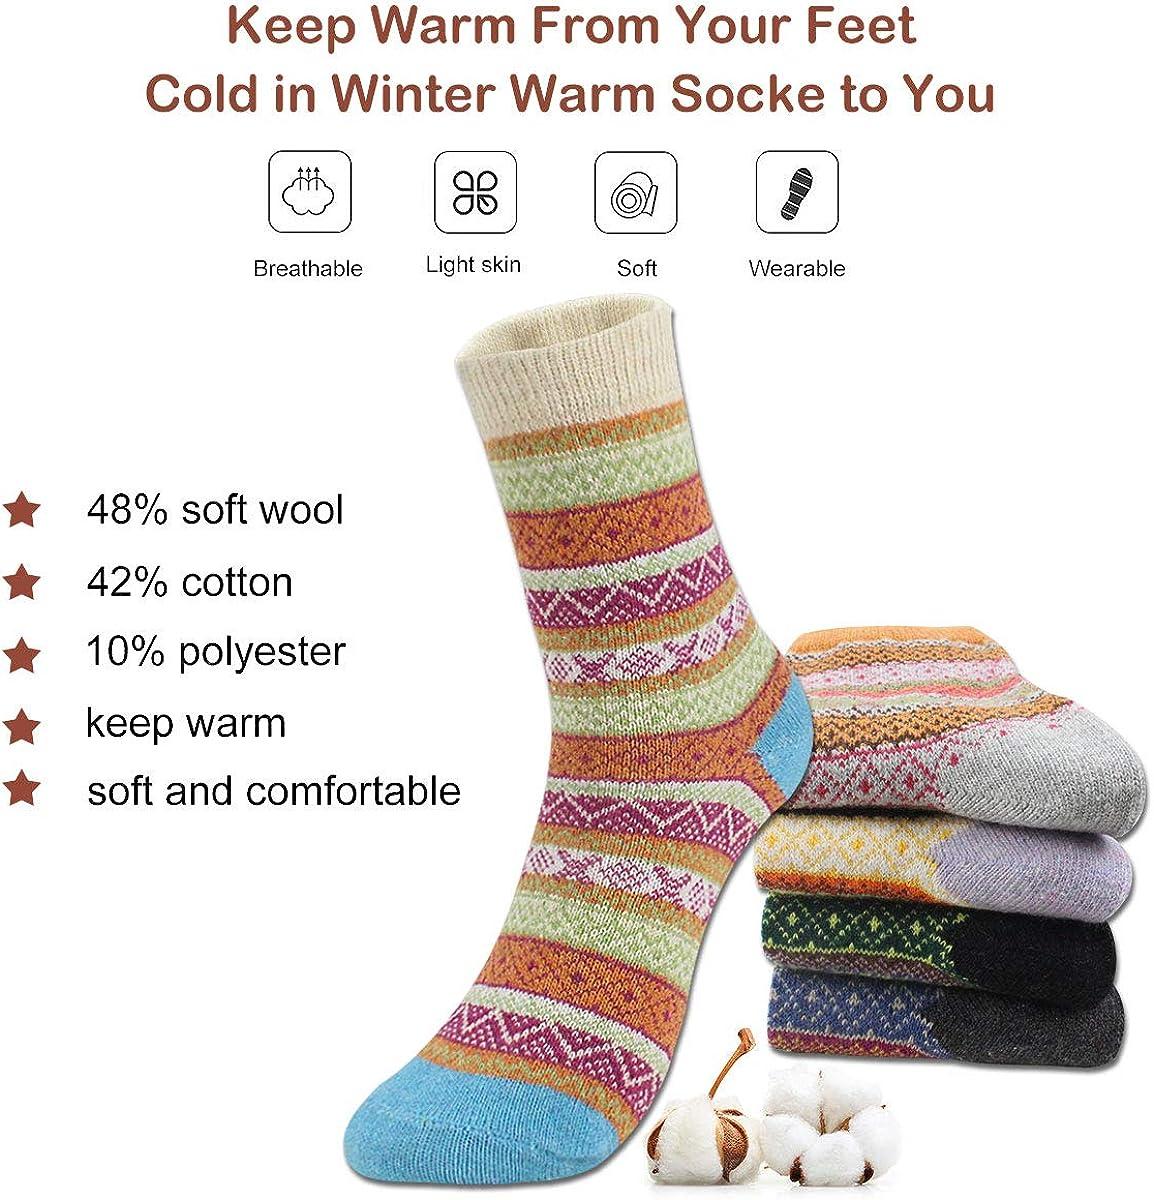 5 Pairs Winter Casual Wool Socks Thick Knit Warm Vintage Crew Socks Christmas Gifts Women Vintage Socks